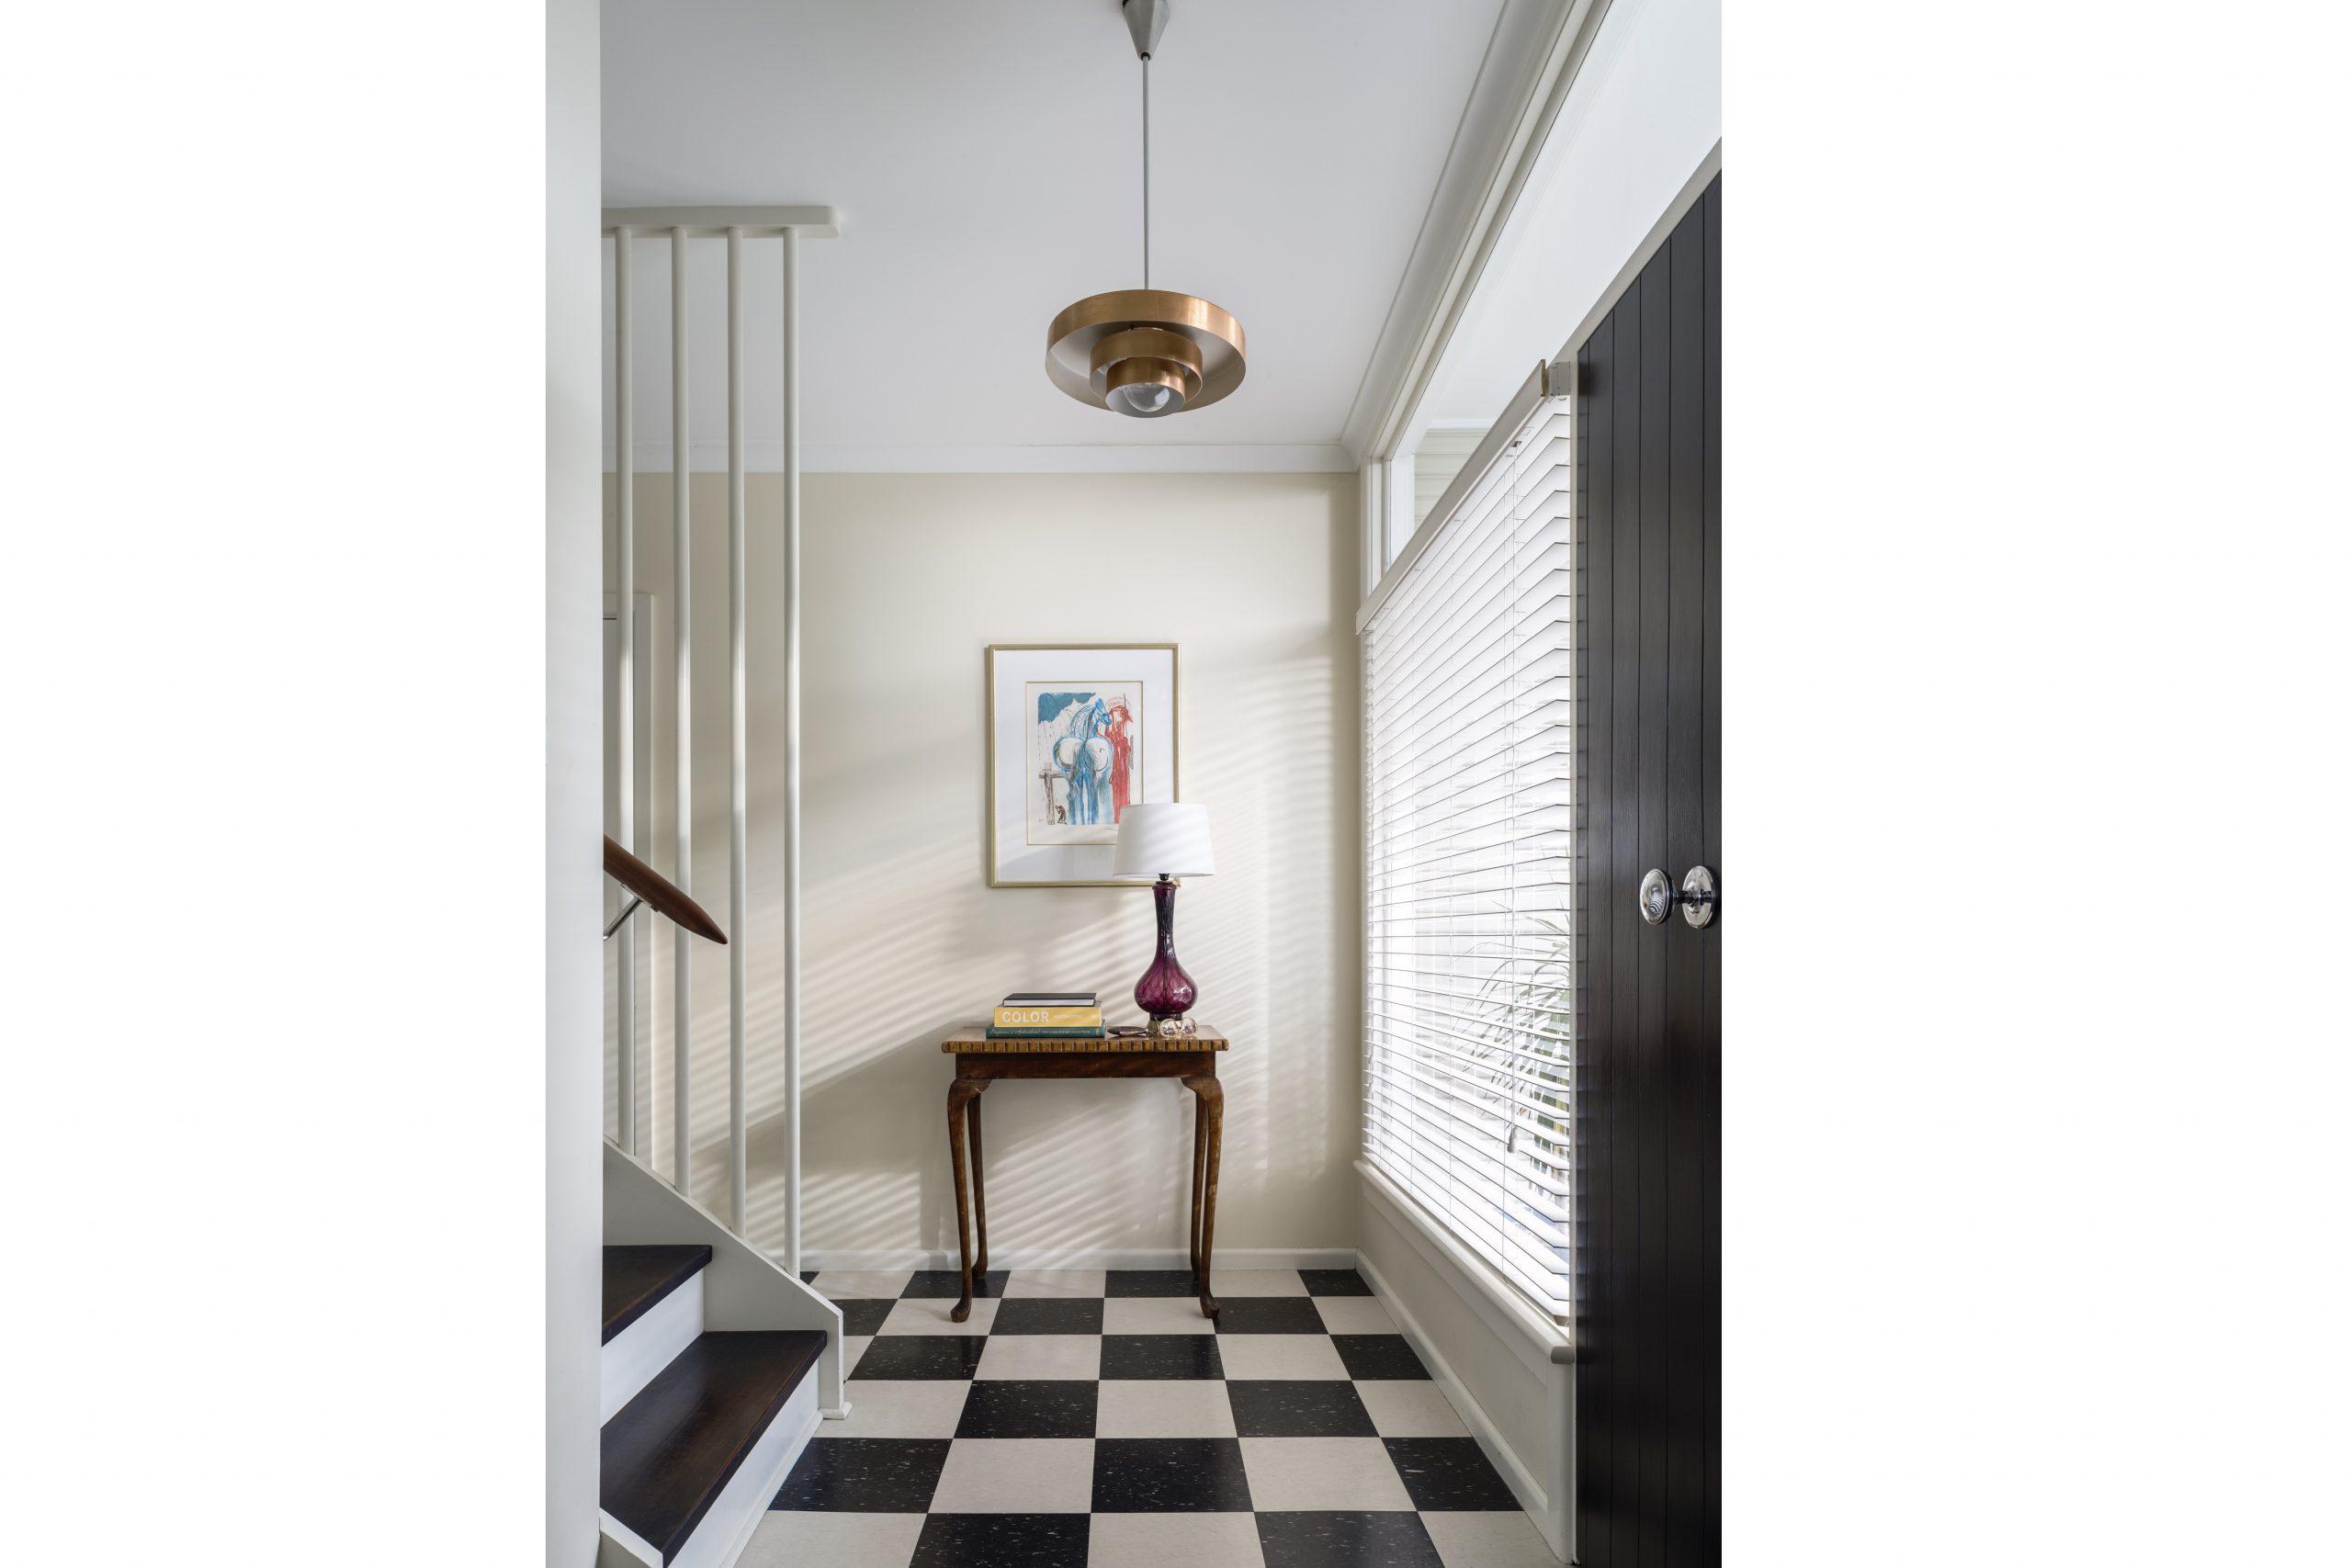 1970s-Checkerboard-Tiles-Entry-Interior-Decoration-Kiama-Michael-Bell-Architects-Sydney